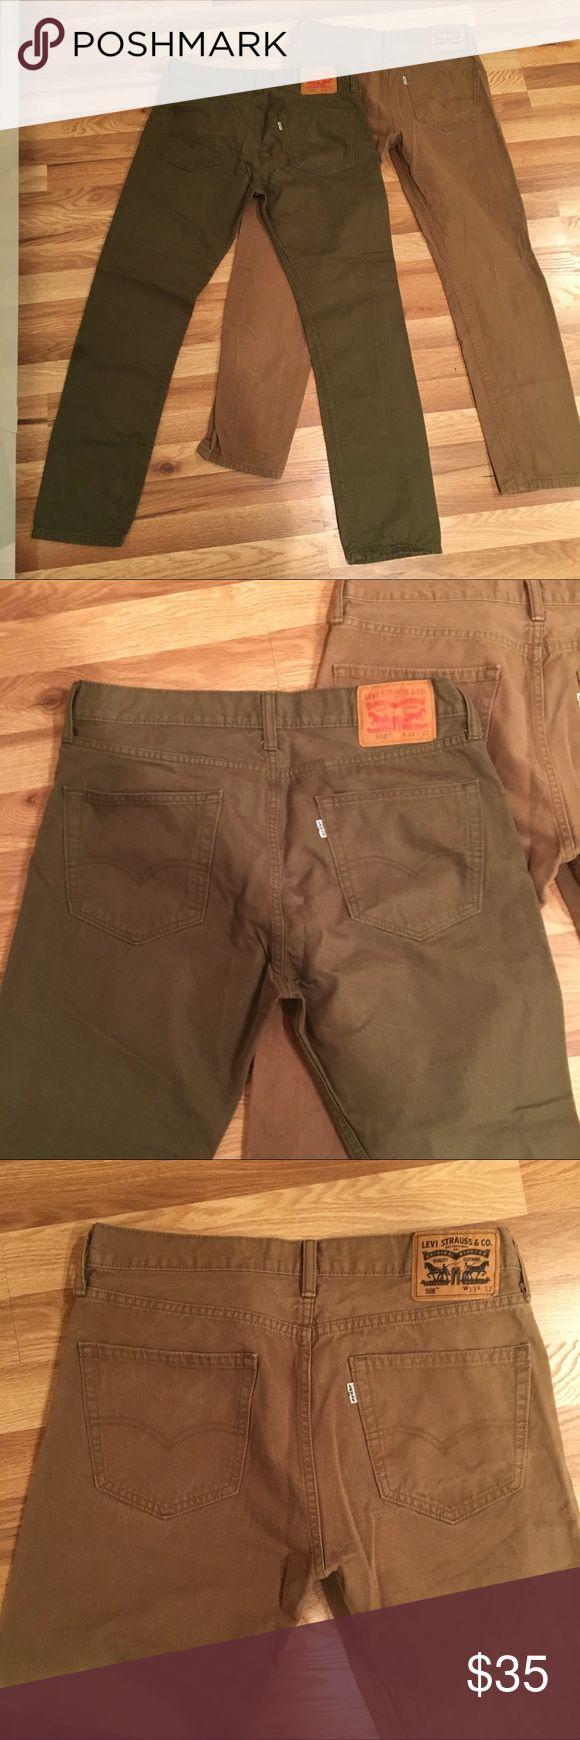 Levi Chino khakis bundle 2 pairs of Levi Chino Khaki pants. Both size W33xL32 in great condition Levi's Pants Chinos & Khakis